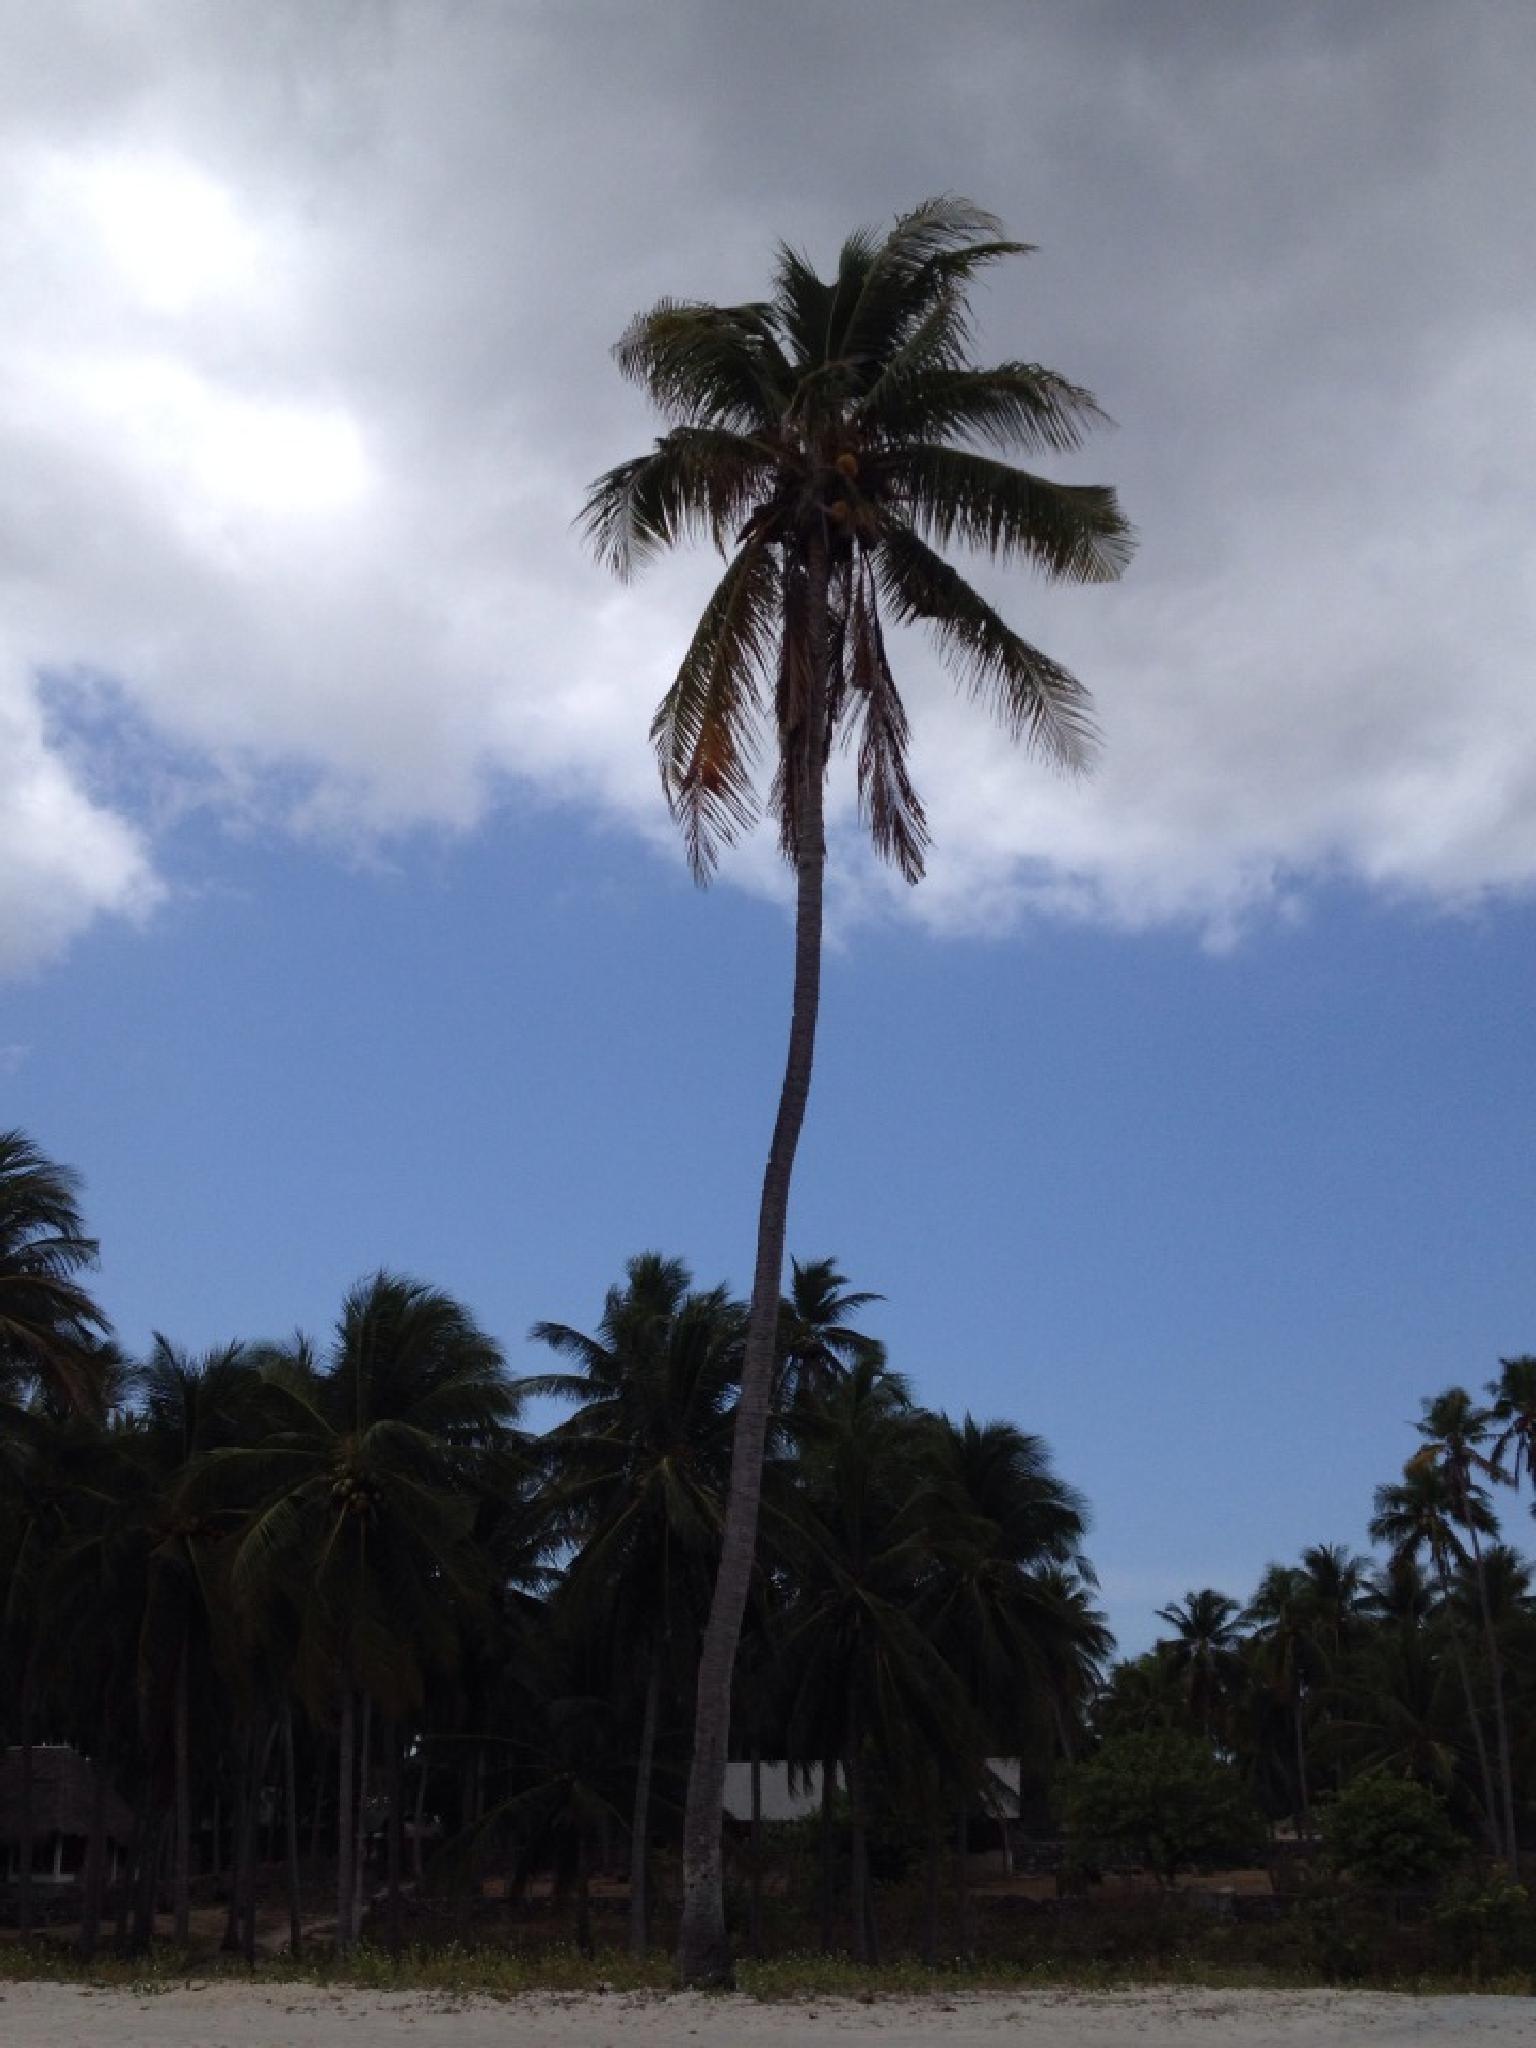 Alone, Rote island, Indomesia. by grossiroma